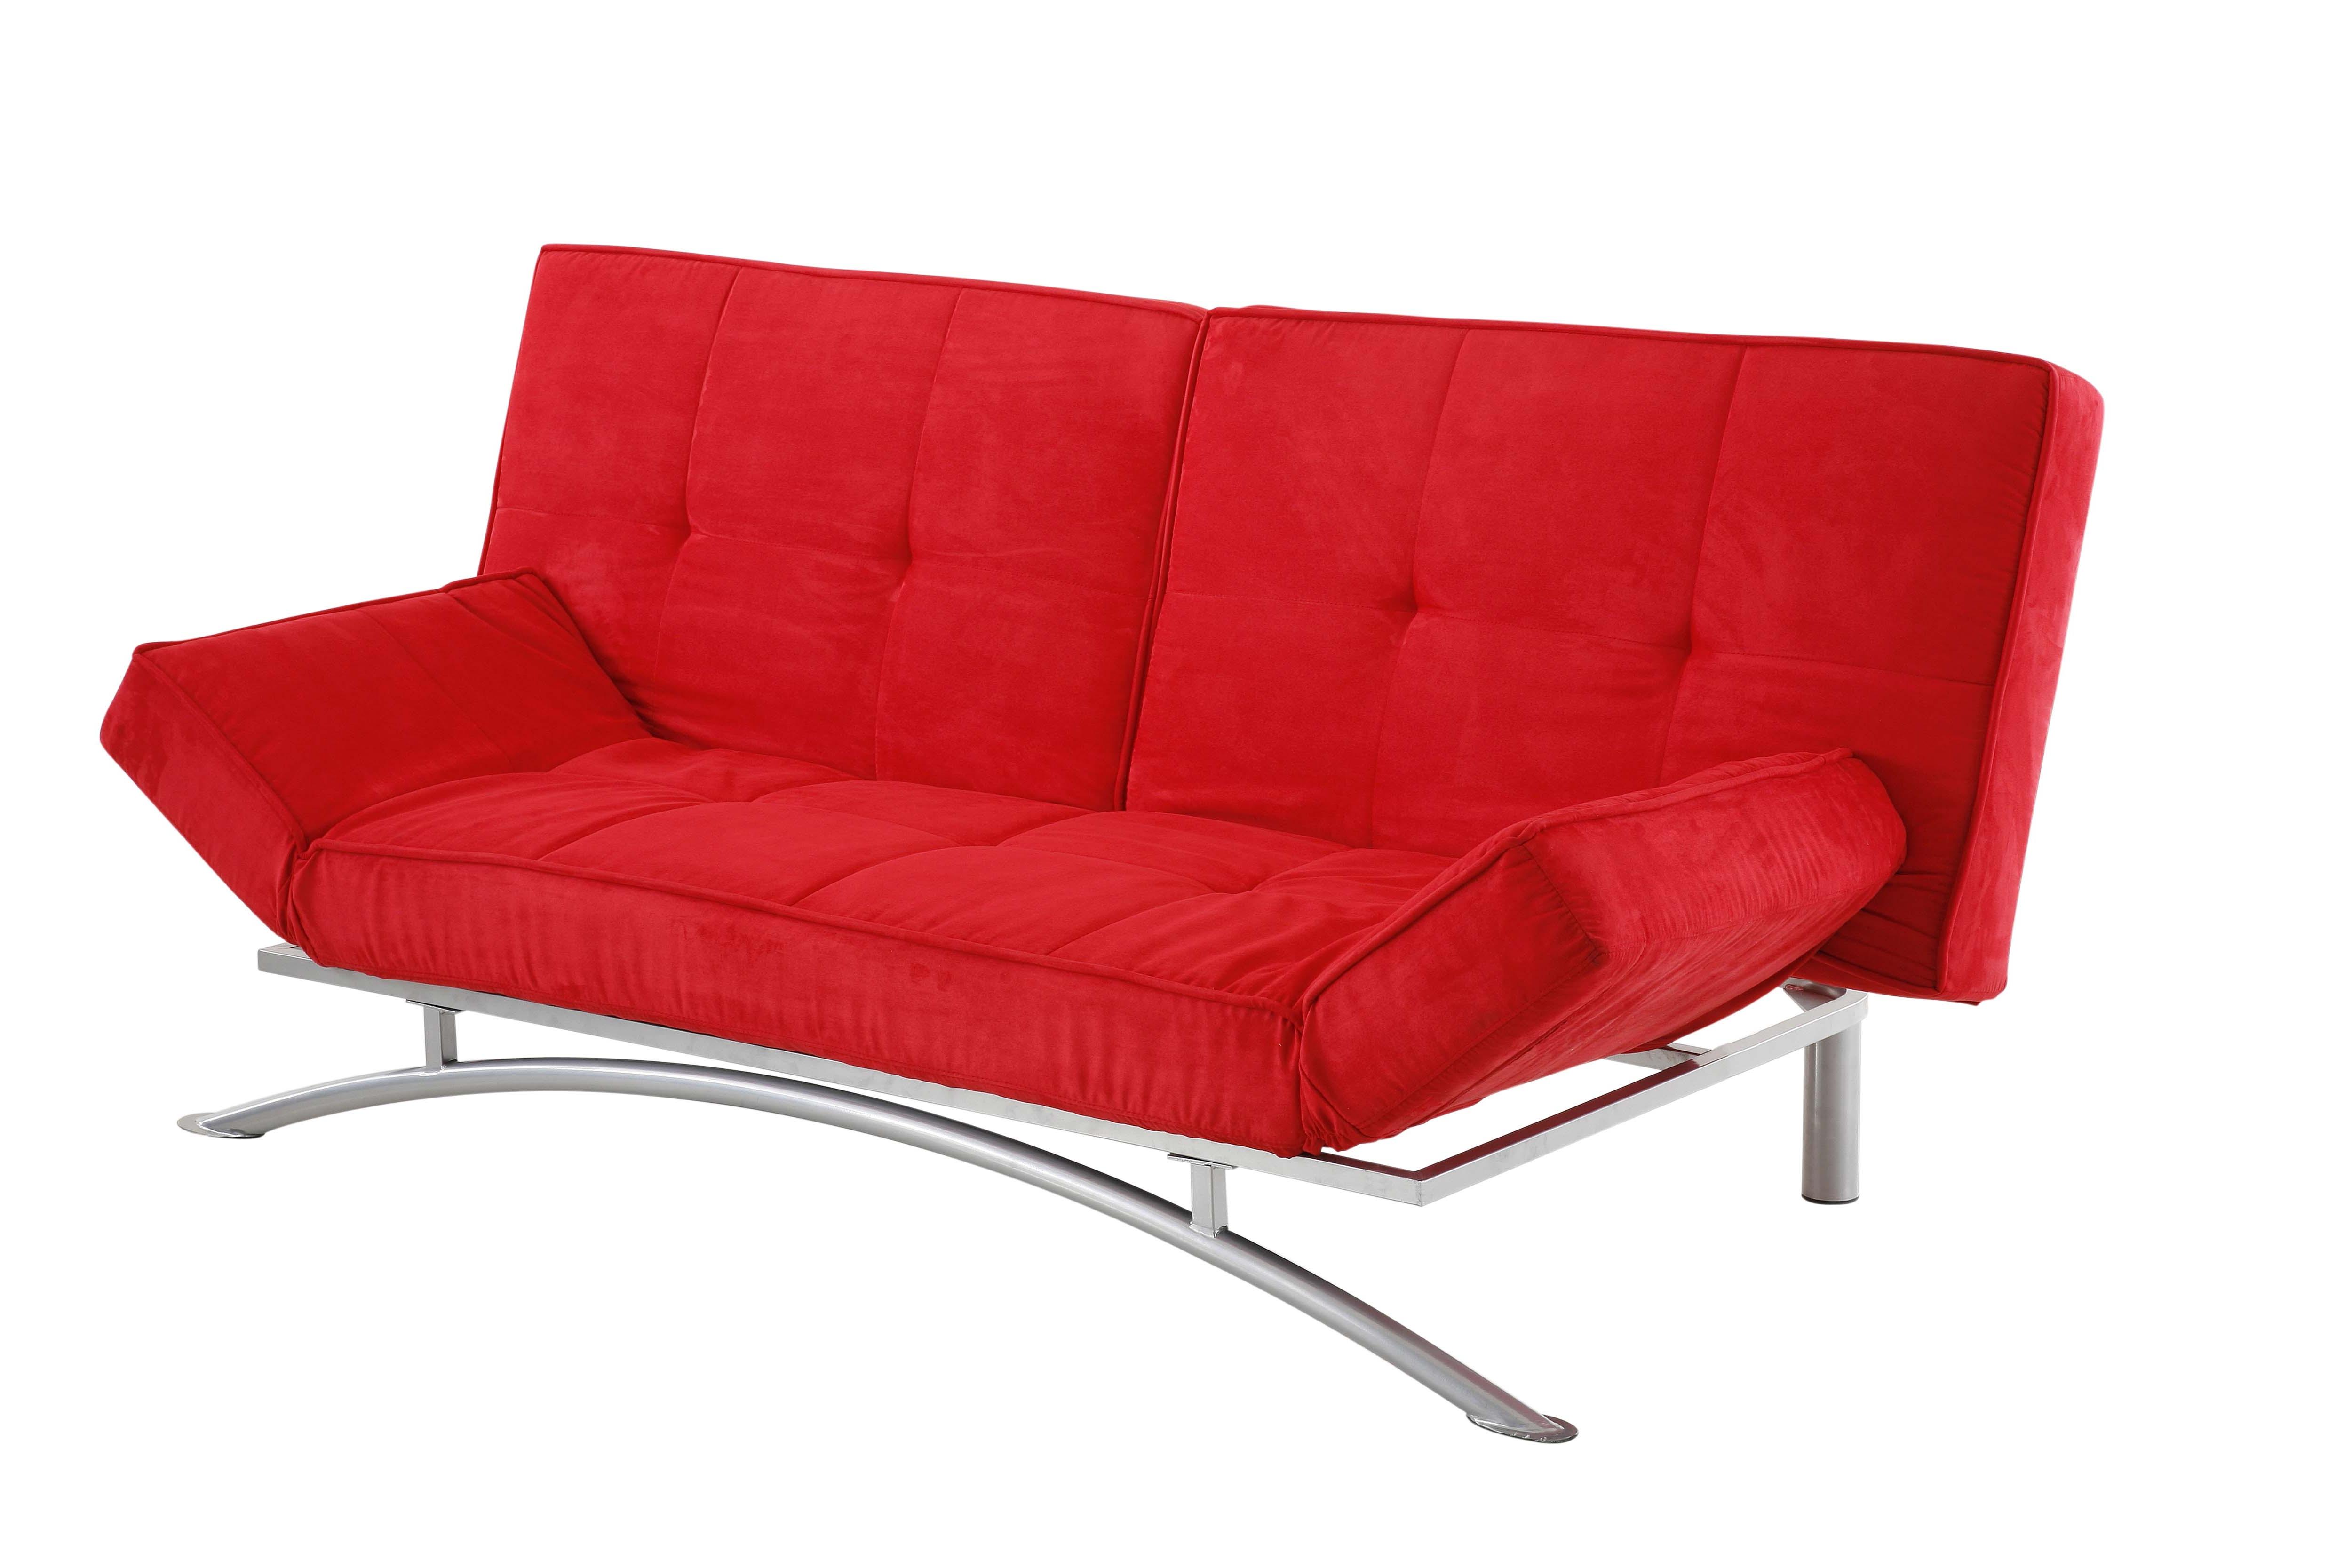 Comprar sofa Cama Online 3ldq sofà S Cama Baratos Online Prar sofà Cama Mueblix